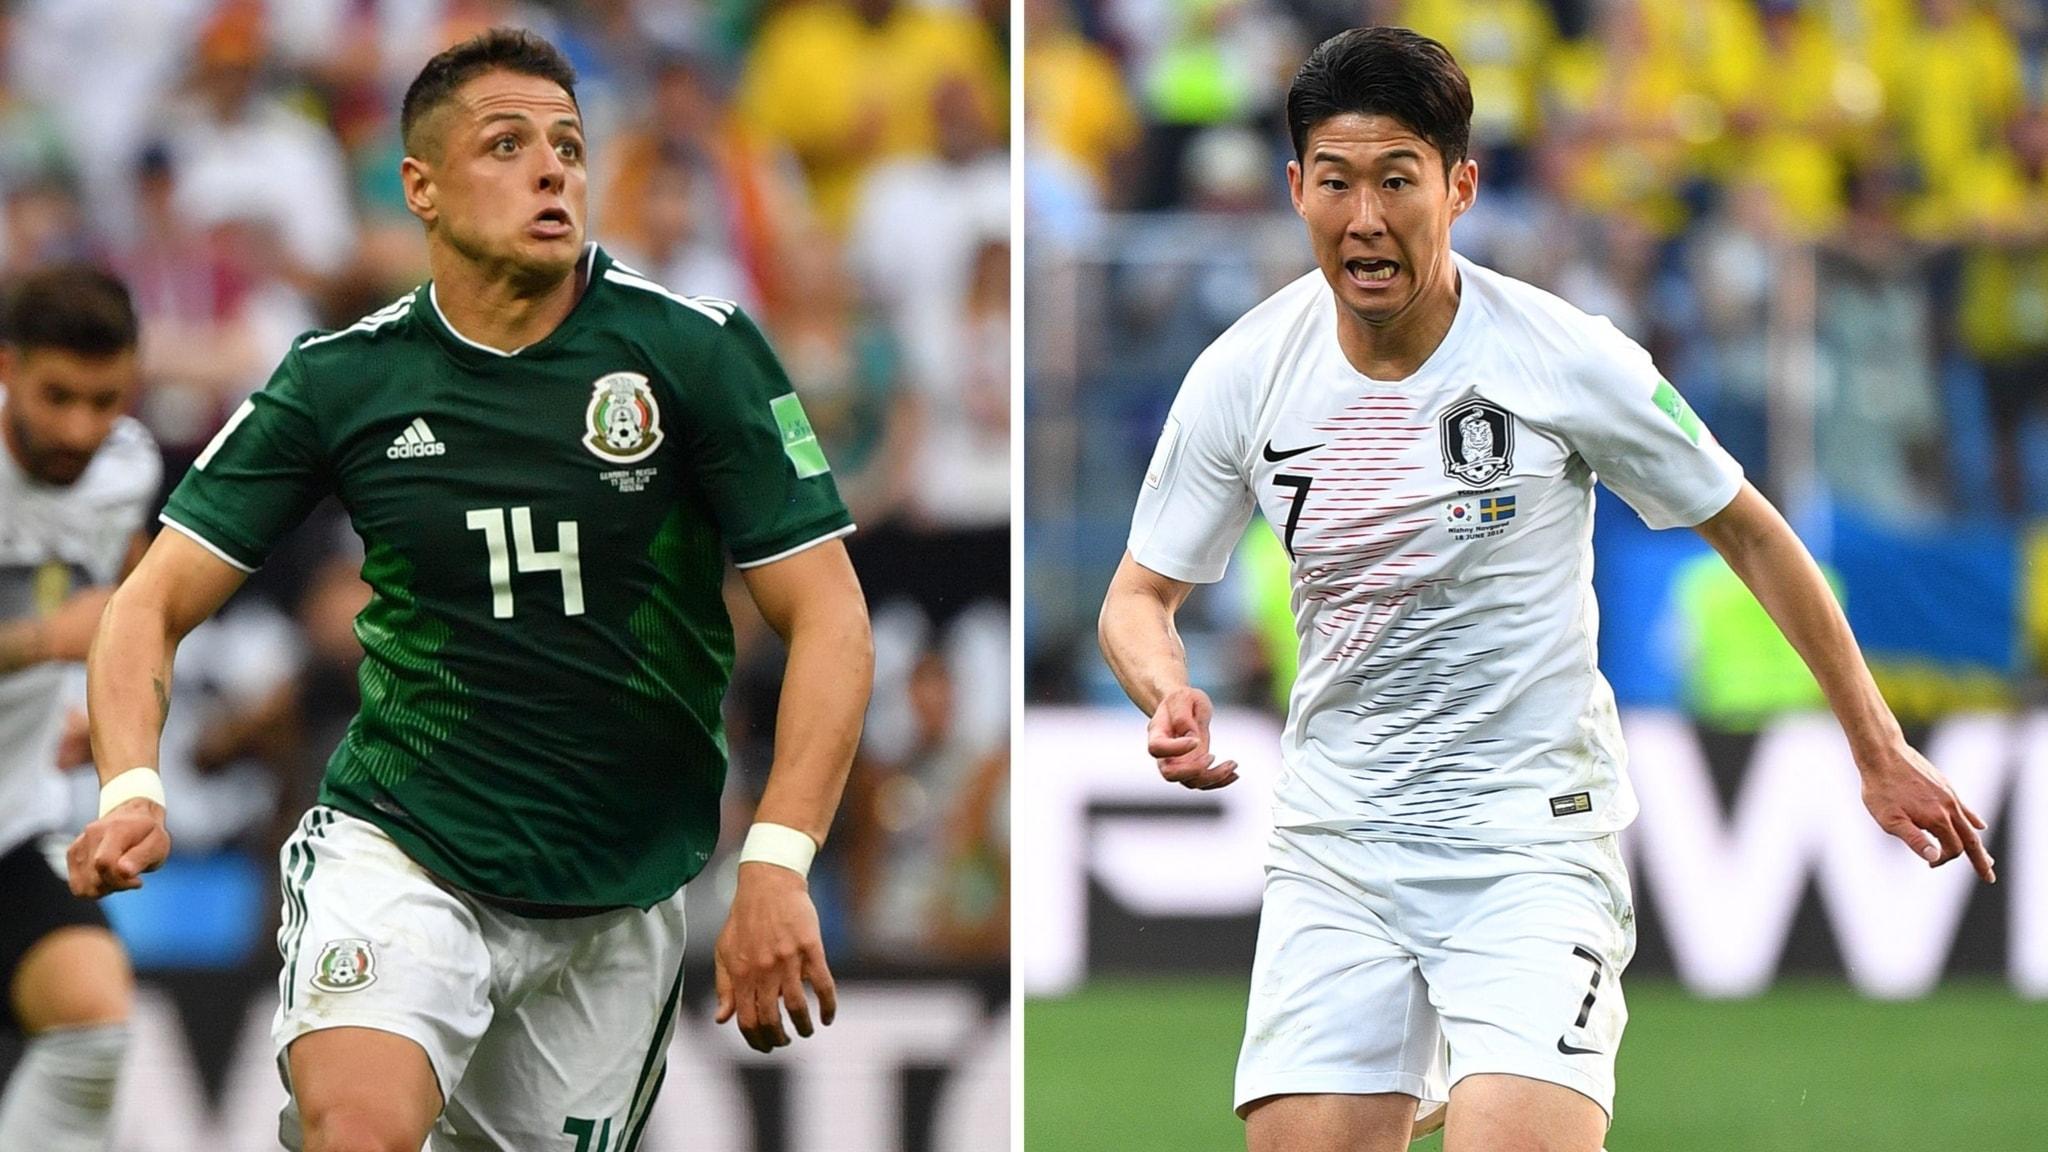 Matchguide Sydkorea-Mexiko - Fotbolls-VM 2018 - Fotboll  d3b02d1951f80